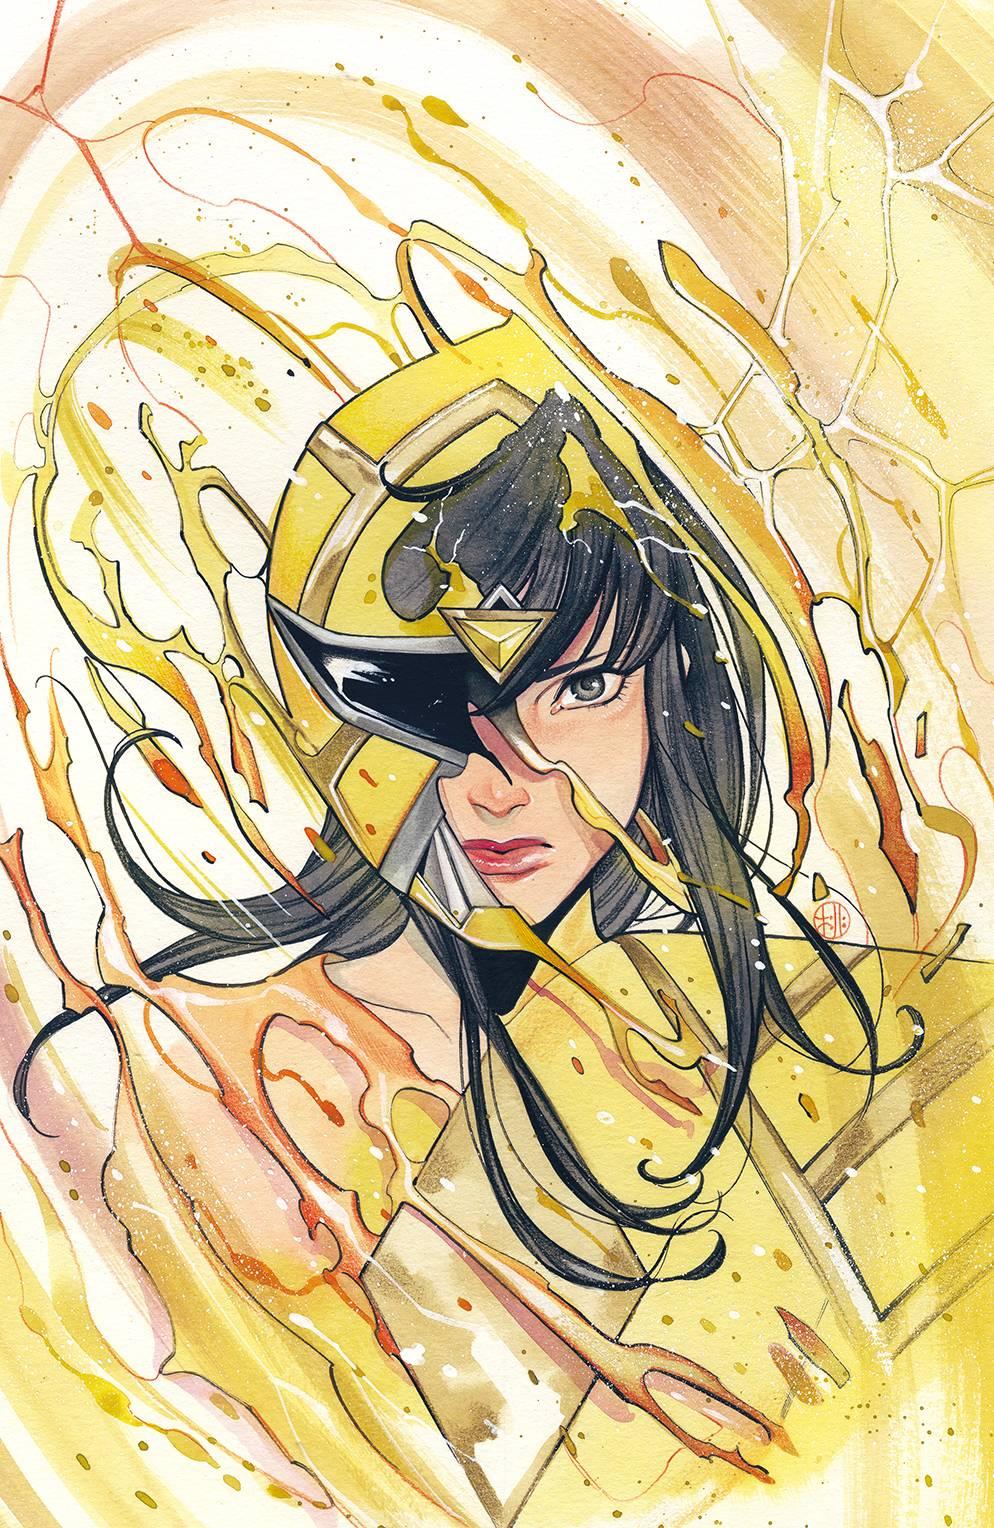 STL173467 ComicList: BOOM! Studios New Releases for 01/20/2021